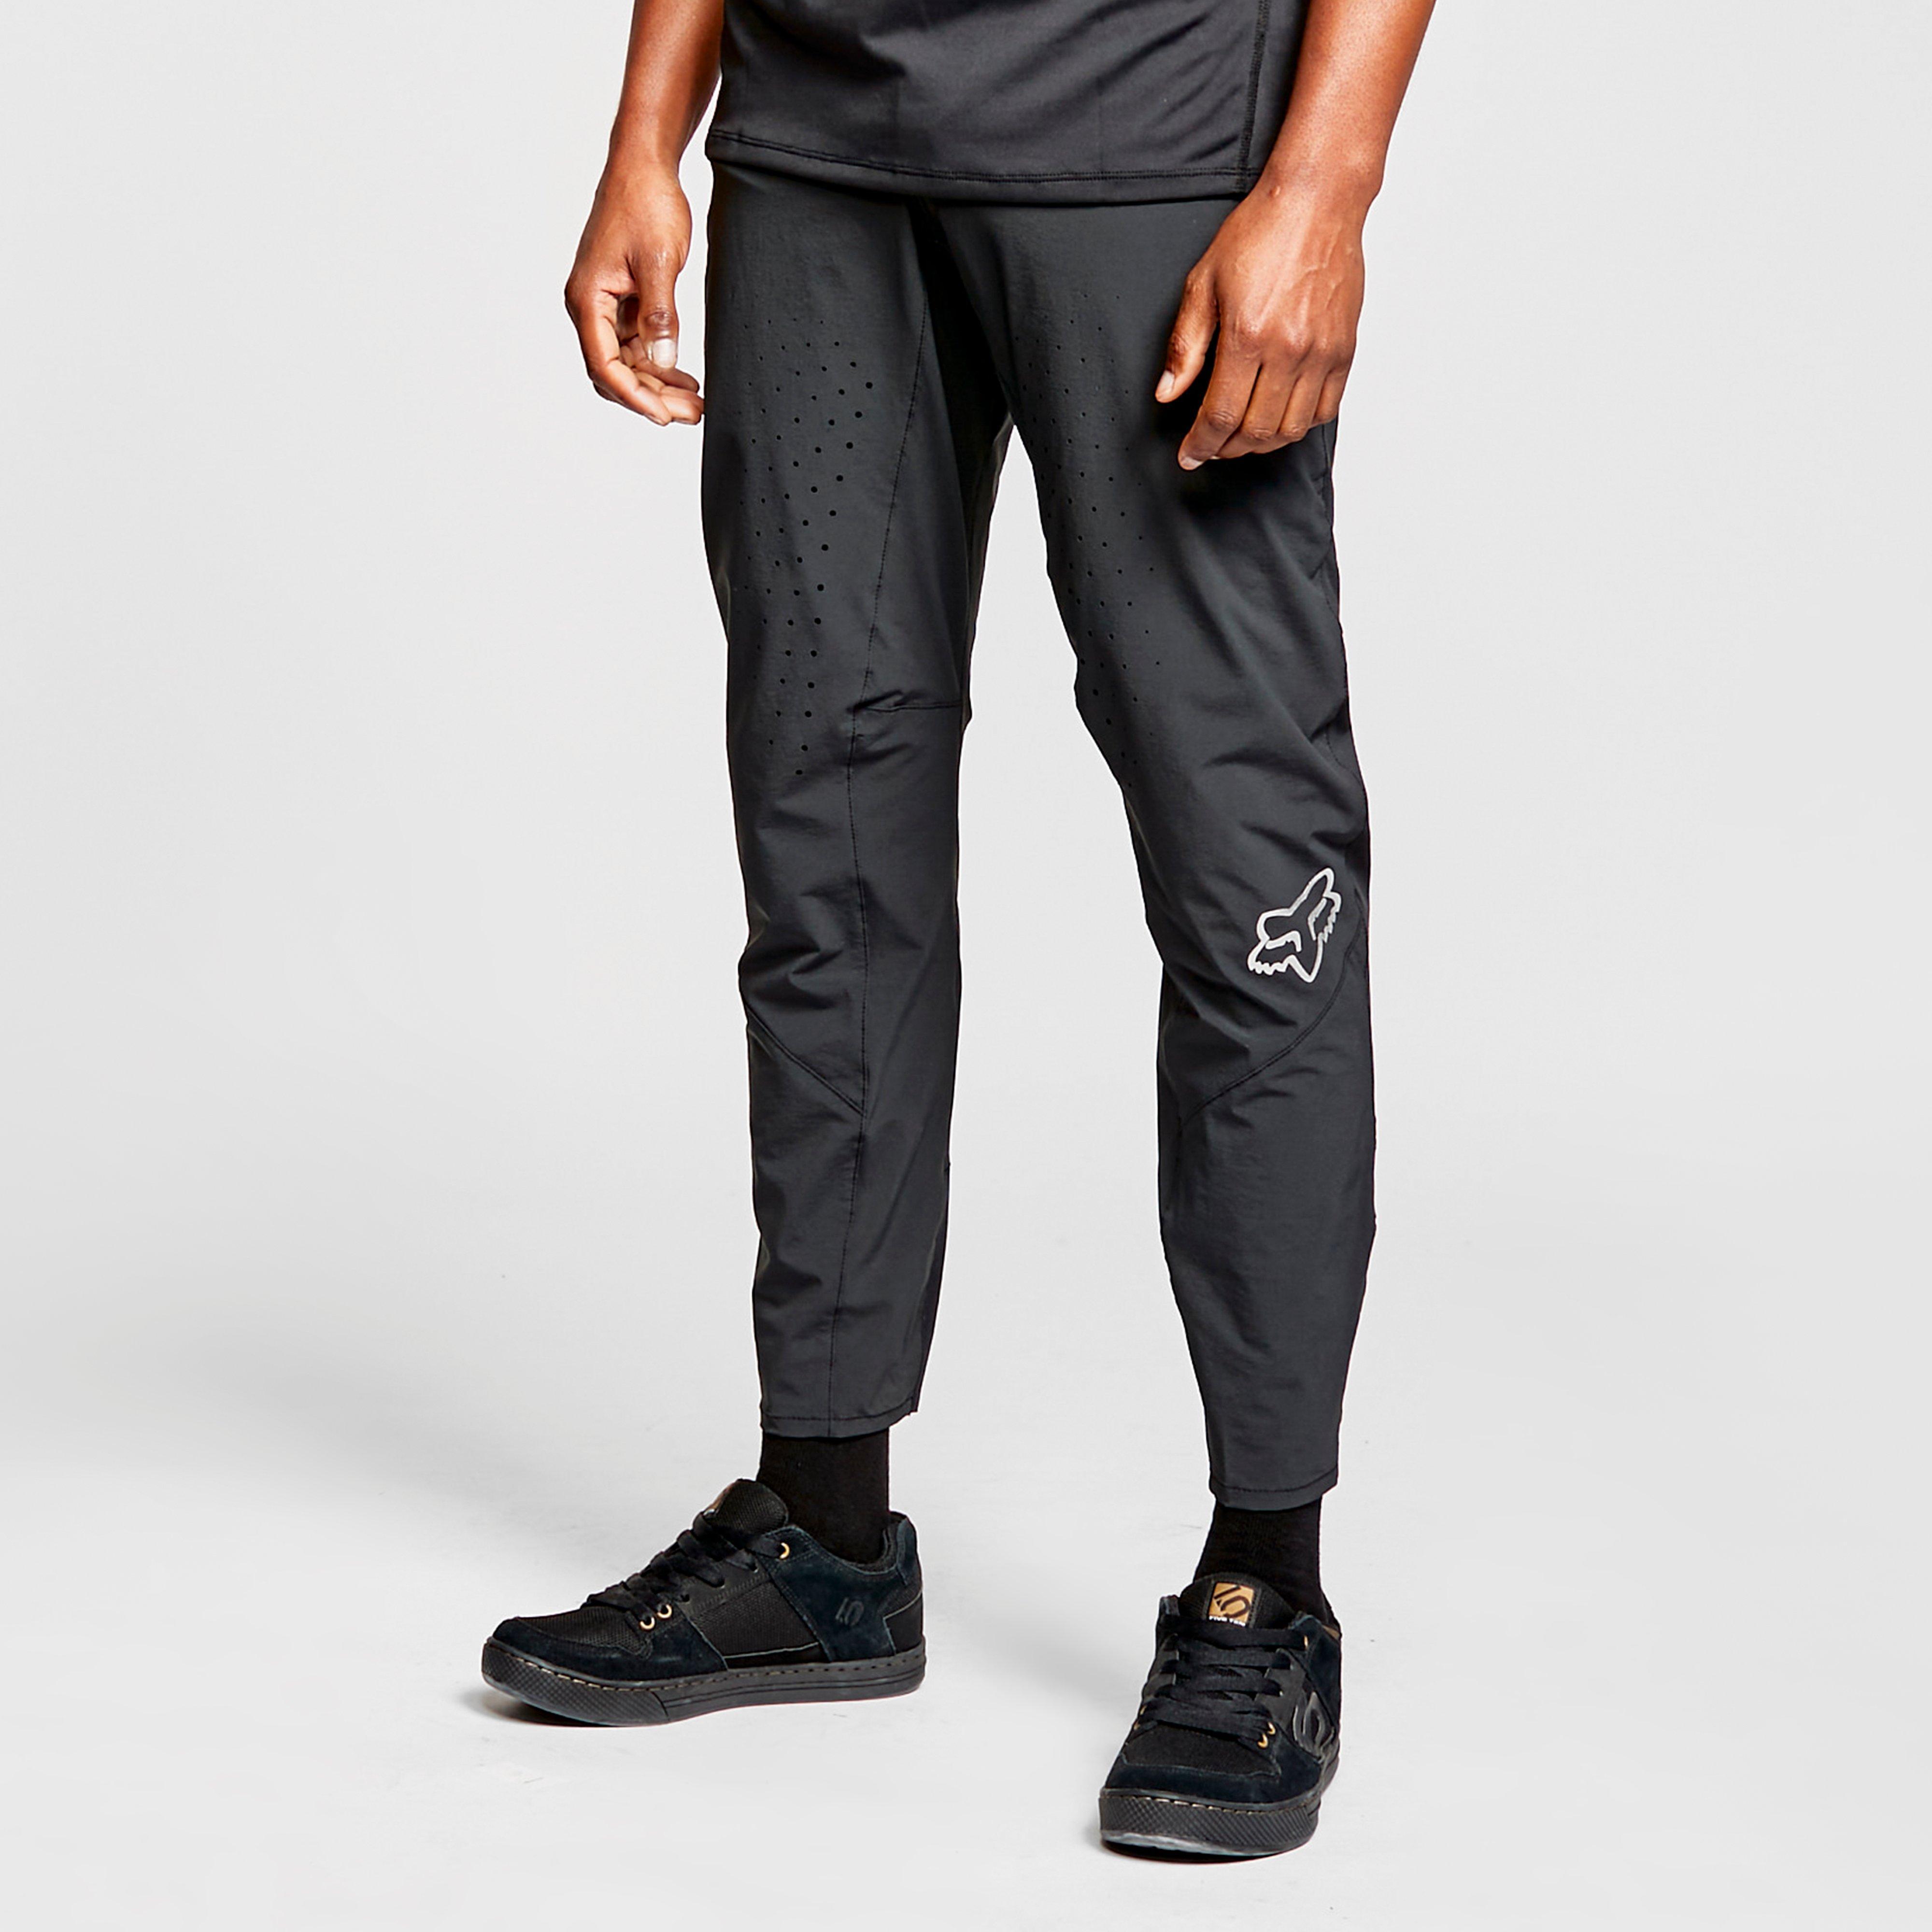 Fox Men's Flexair Pants - Black/Black, Black